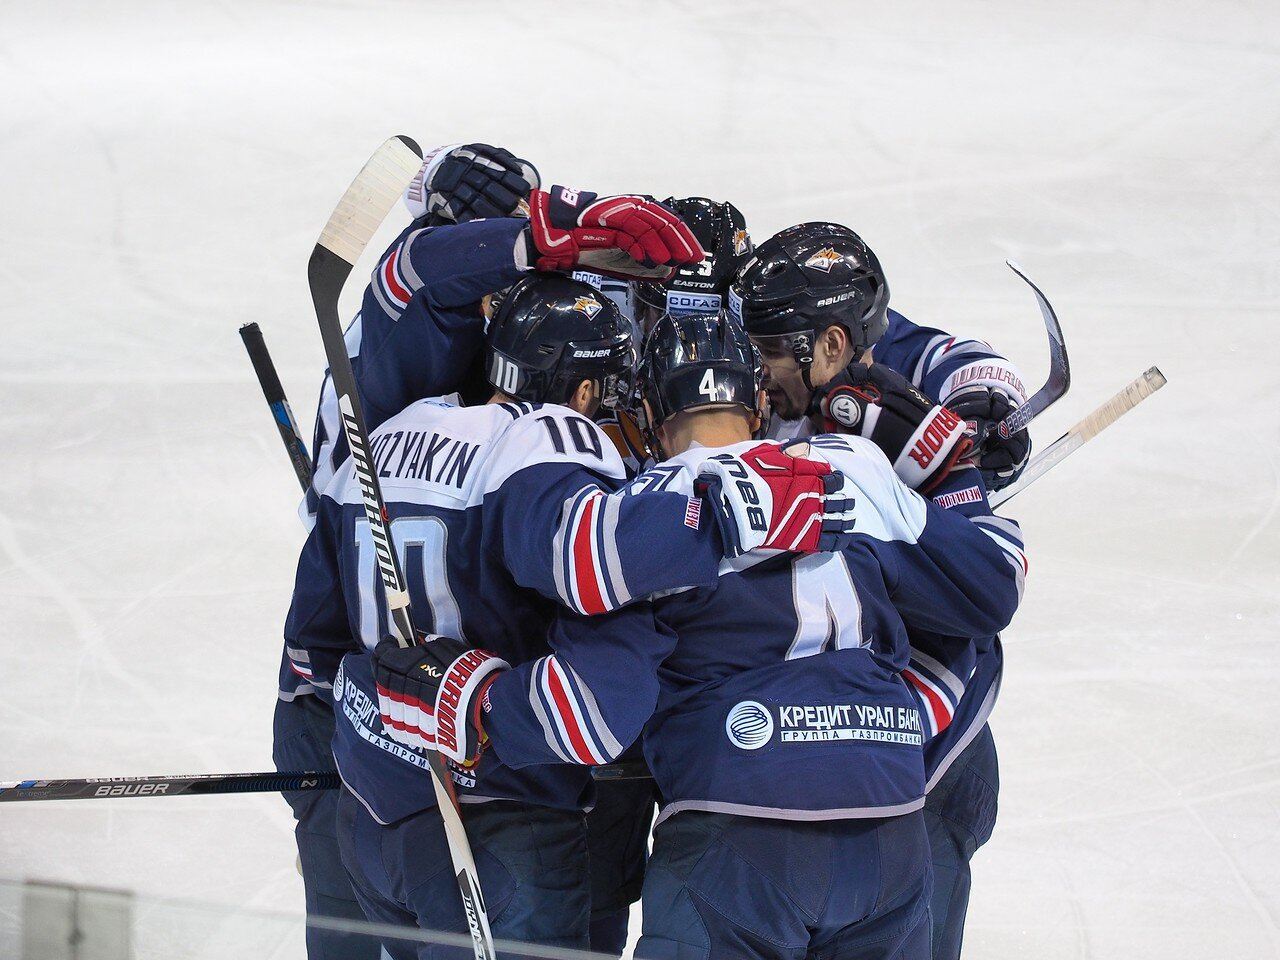 53Плей-офф 2016 Восток 1/2 Металлург - Сибирь 16.03.2016